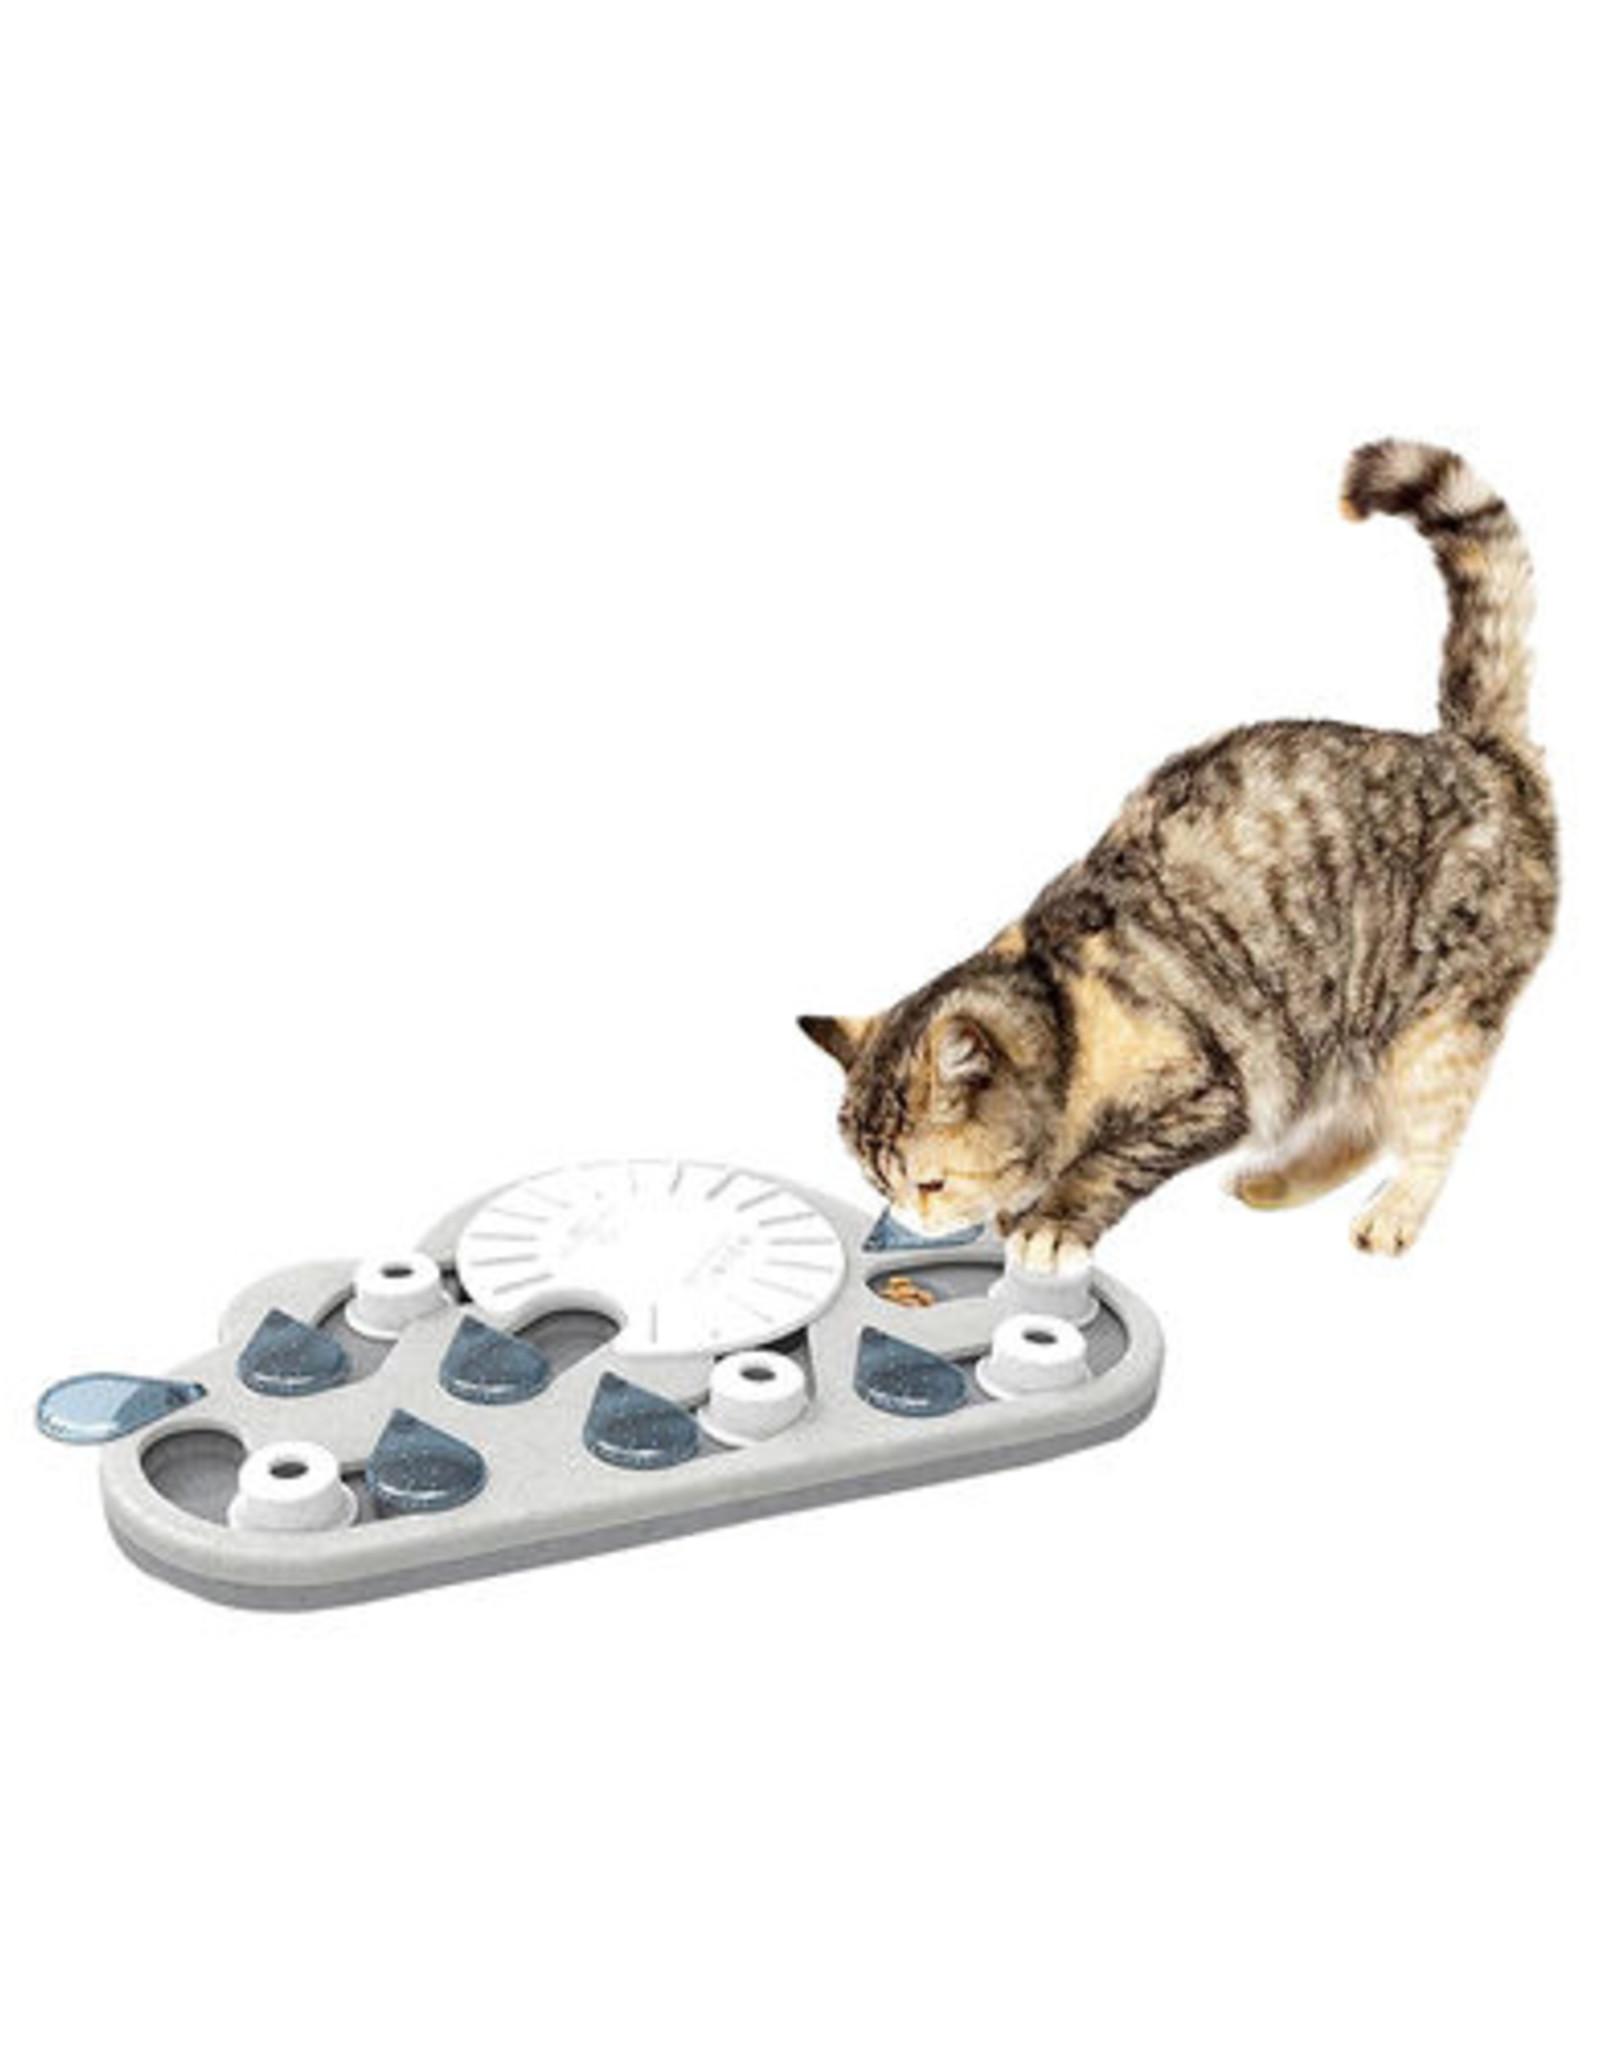 Petstages Cat Puzzle - Rainy Day